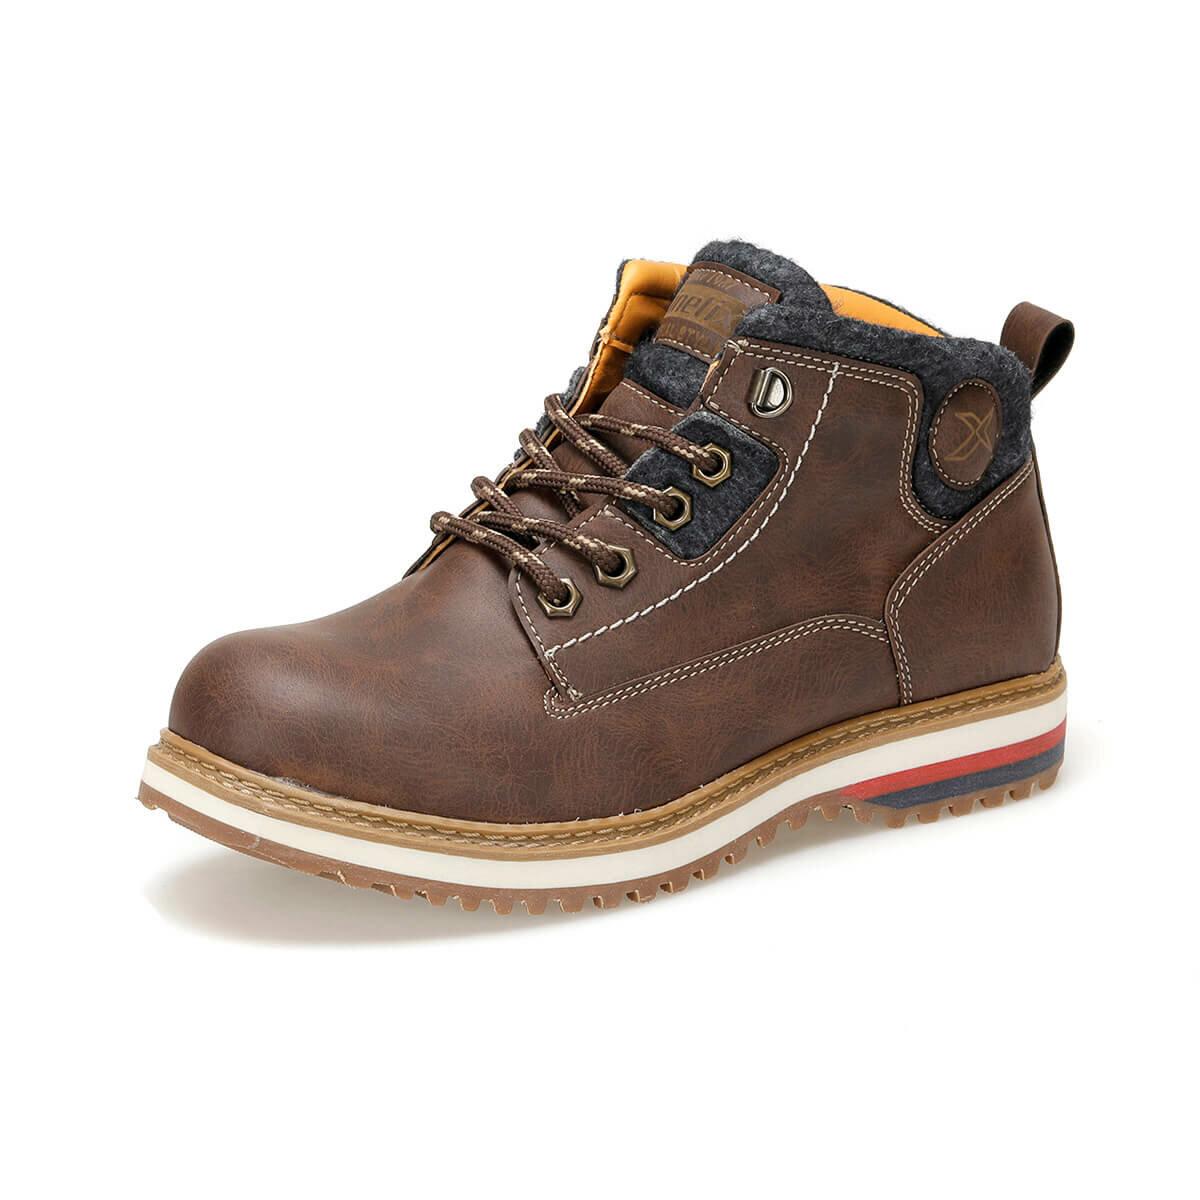 FLO EFRON G 9PR Tan Male Child Boots KINETIX